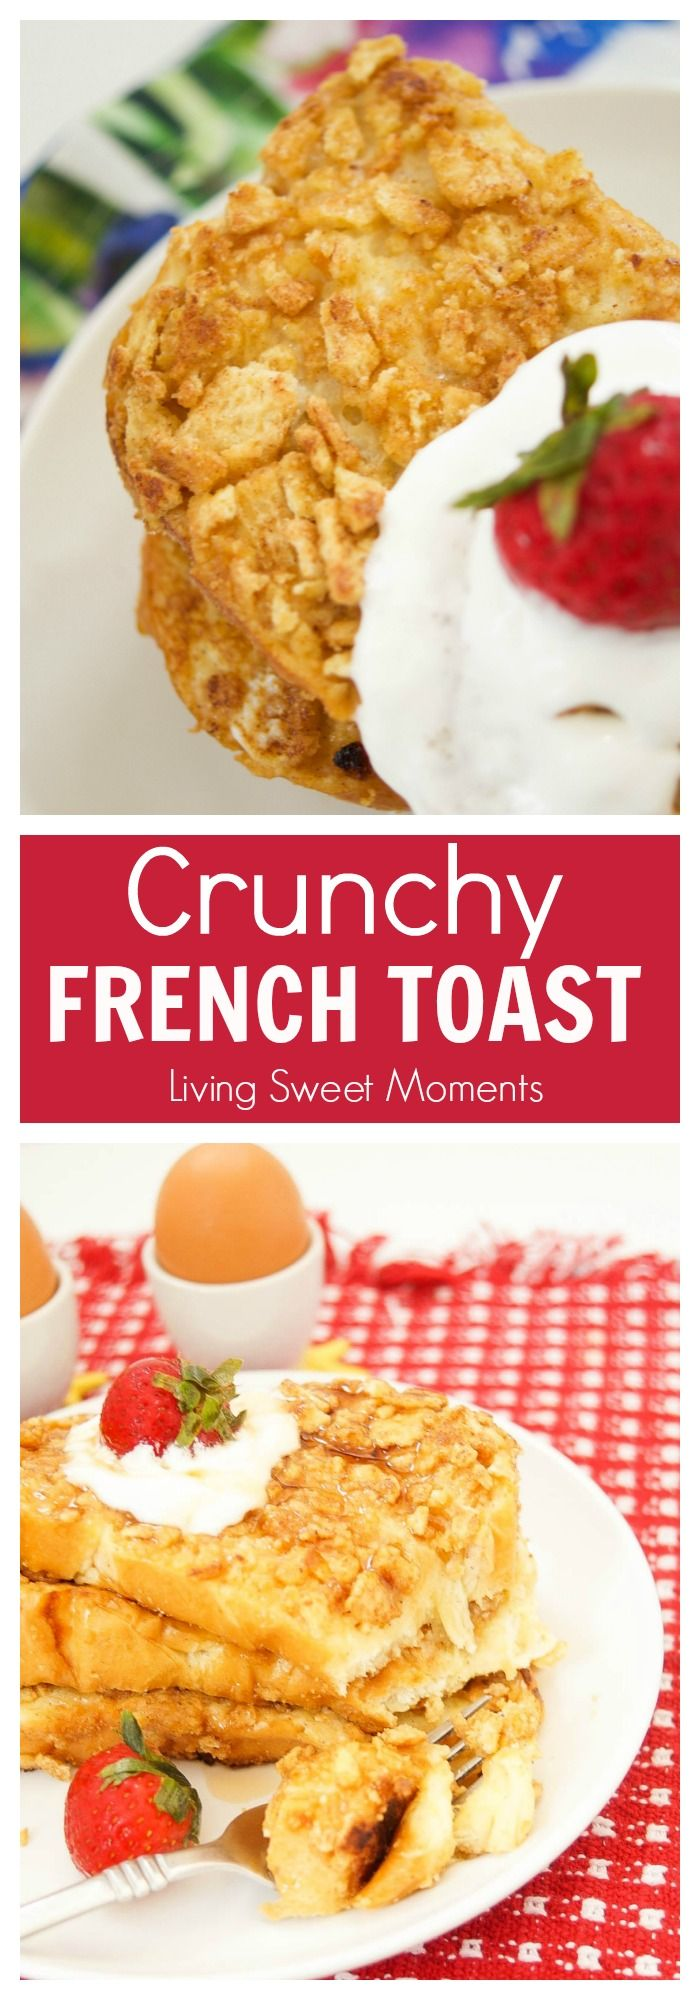 Best 25+ Cinnamon cereal ideas on Pinterest | Kids snack ...